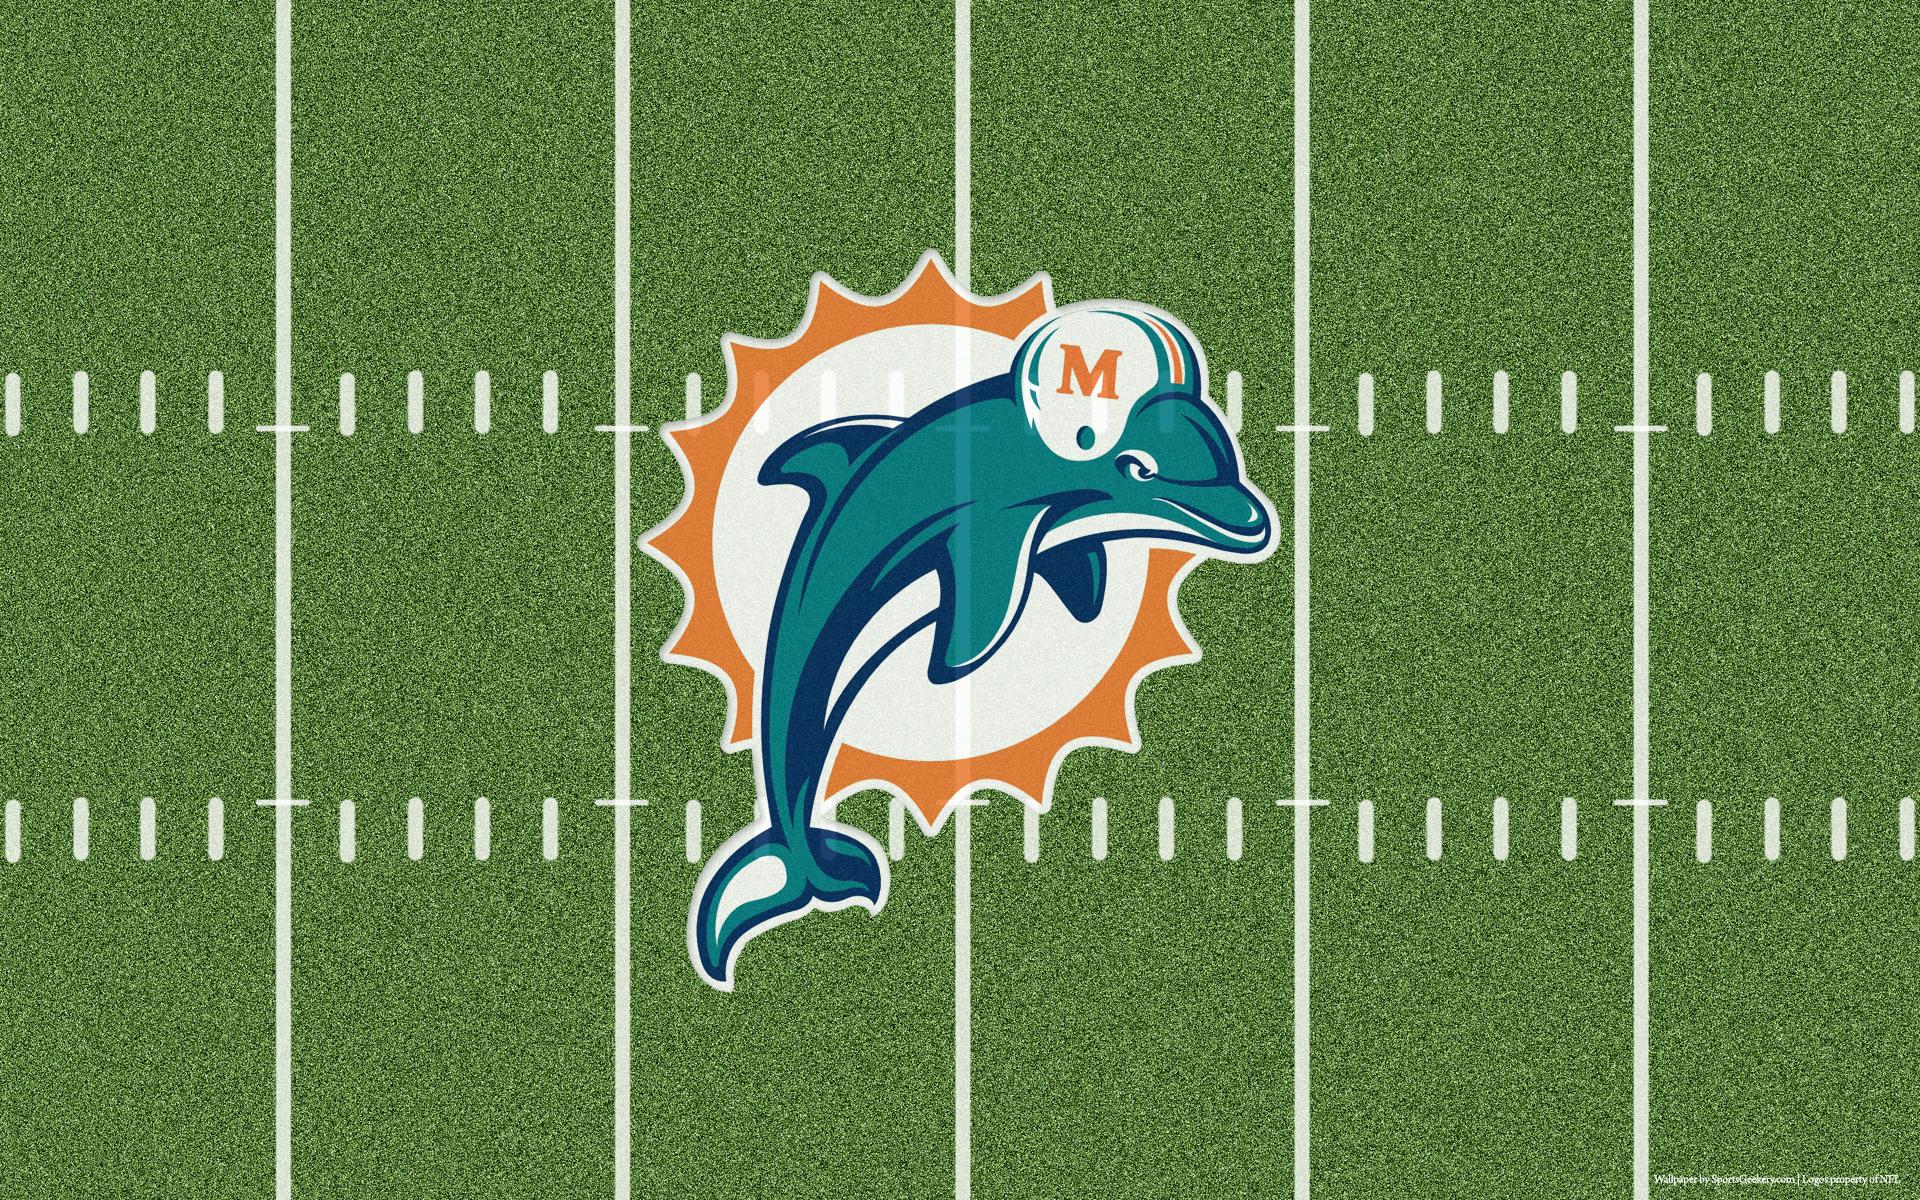 Miami Dolphins Football HD Wallpaper 1080p HD Desktop Wallpaper 1920x1200